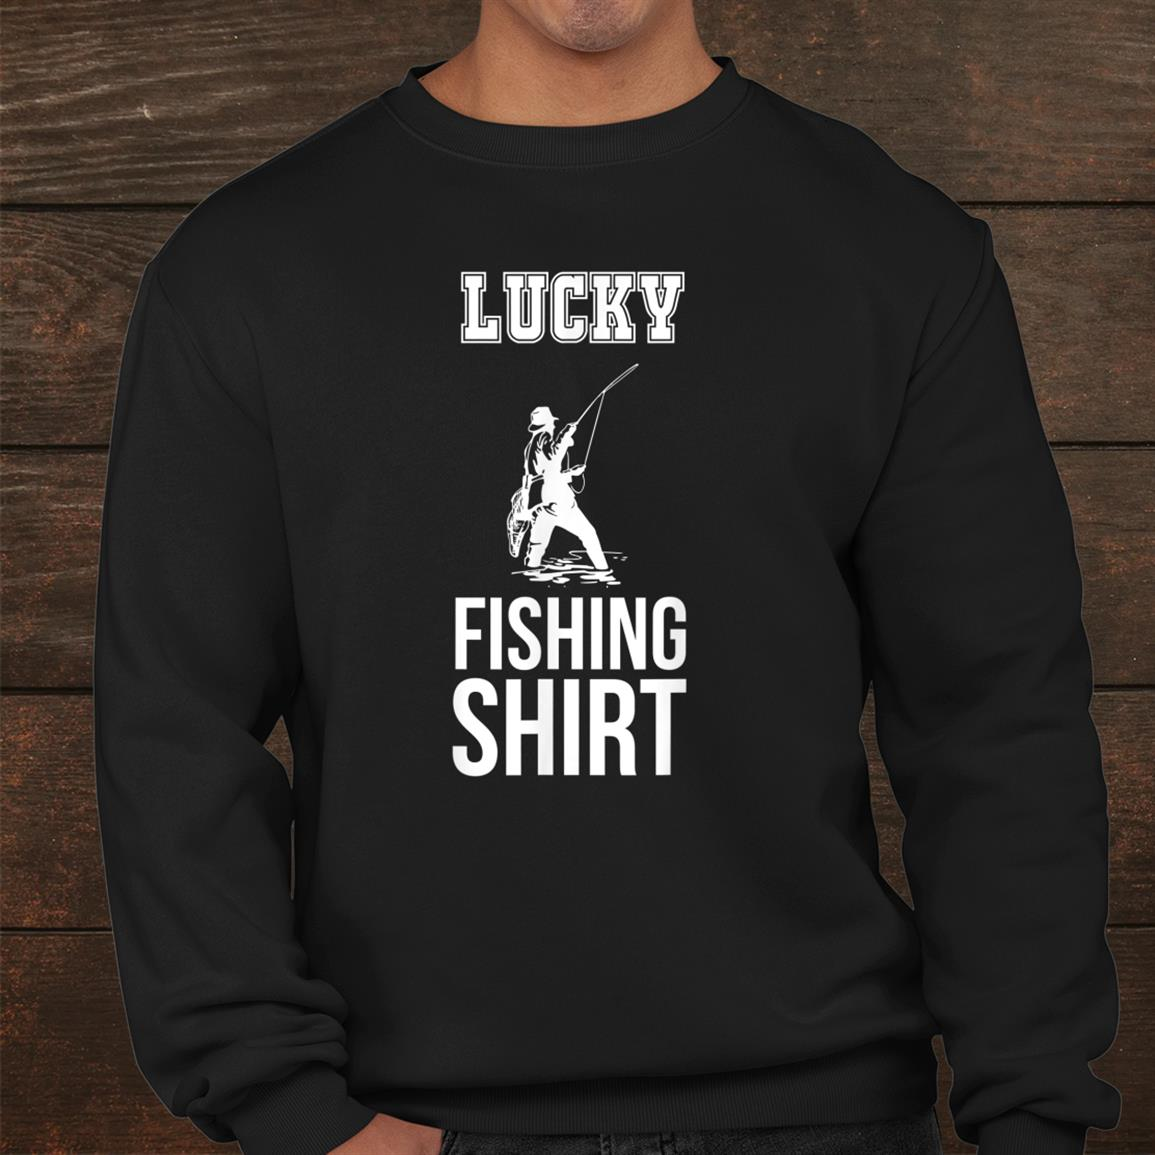 Fisherman Lucky Fishing Shirt Dad Husband Boyfriend Shirt